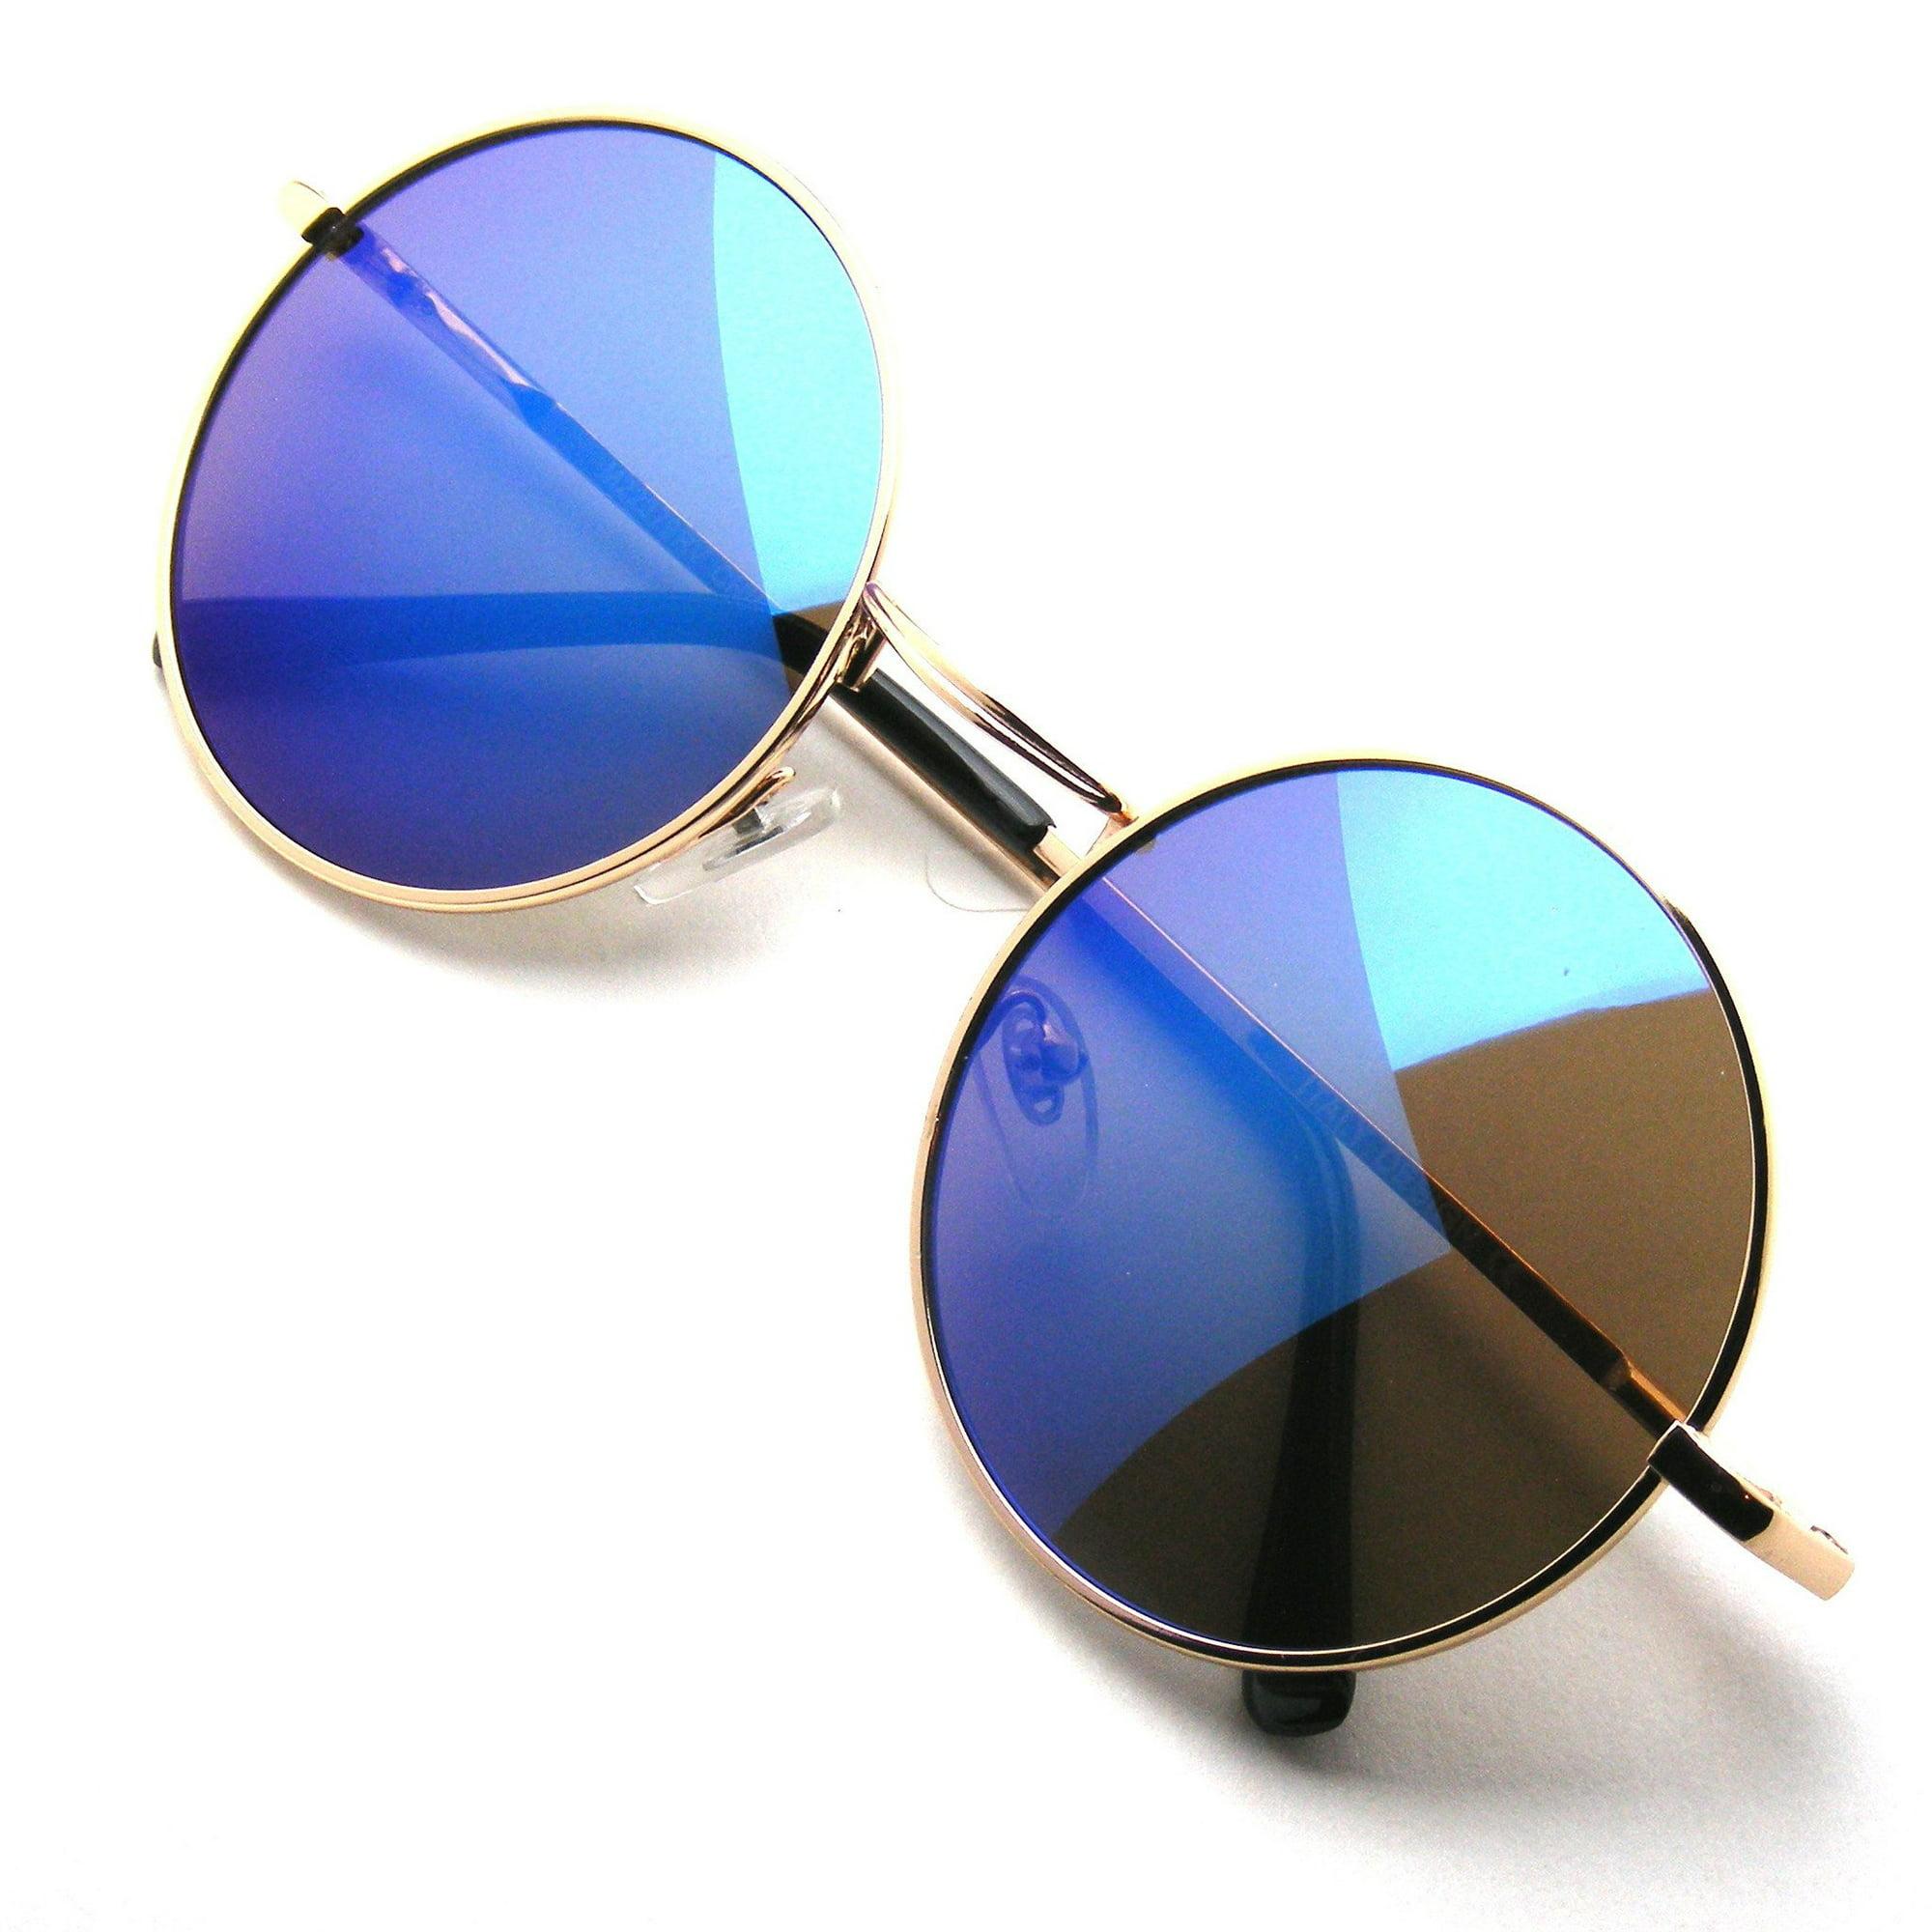 fb679ca50 Emblem Eyewear - John Lennon Inspired Sunglasses Round Hippie Shades Retro  Reflective Colored Lenses   Walmart Canada